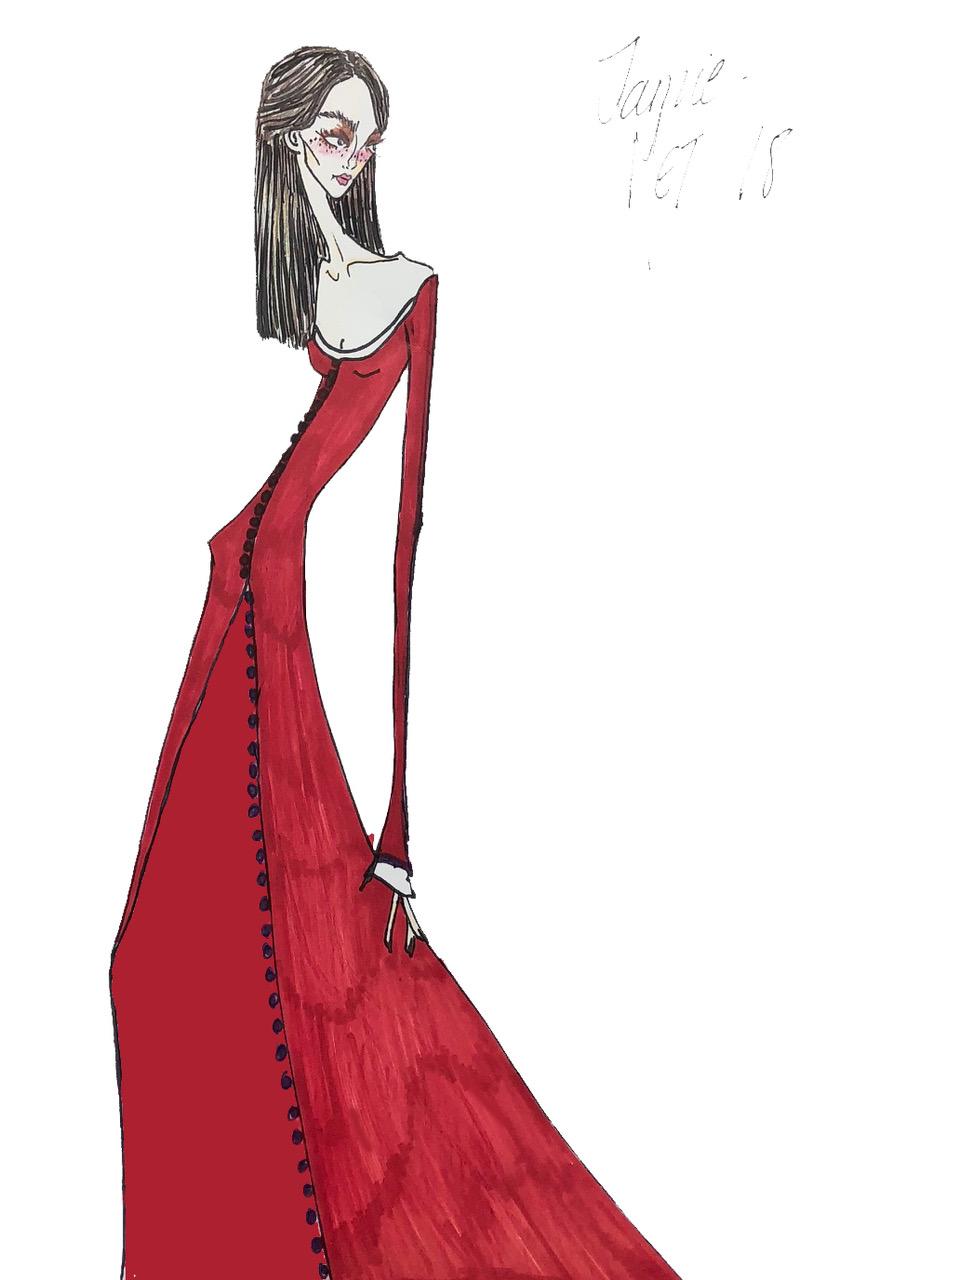 A sketch of Juicy Couture creative director Jamie Mizrahi's Met Gala gown.